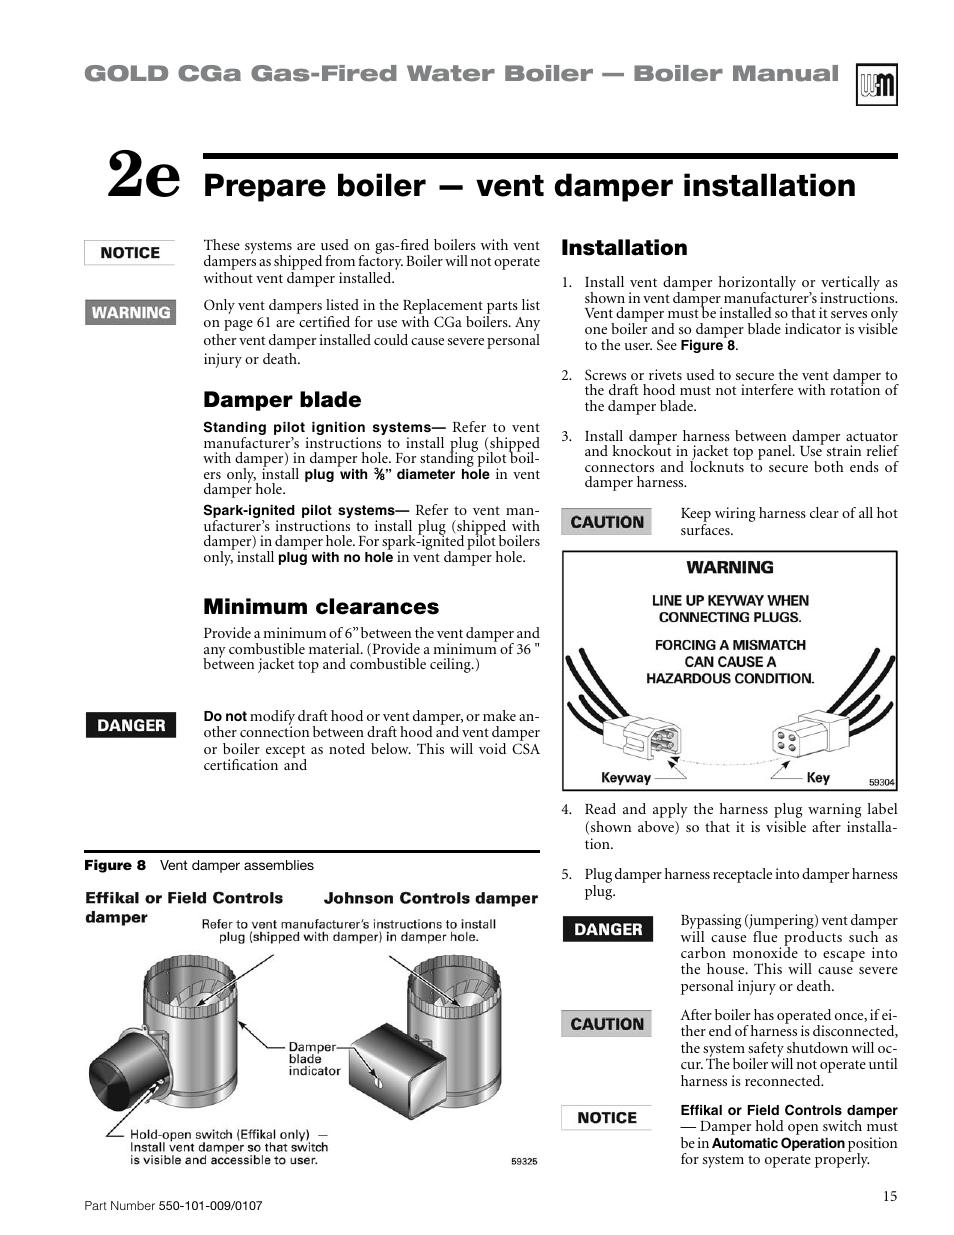 Prepare Boiler  U2014 Vent Damper Installation  Gold Cga Gas